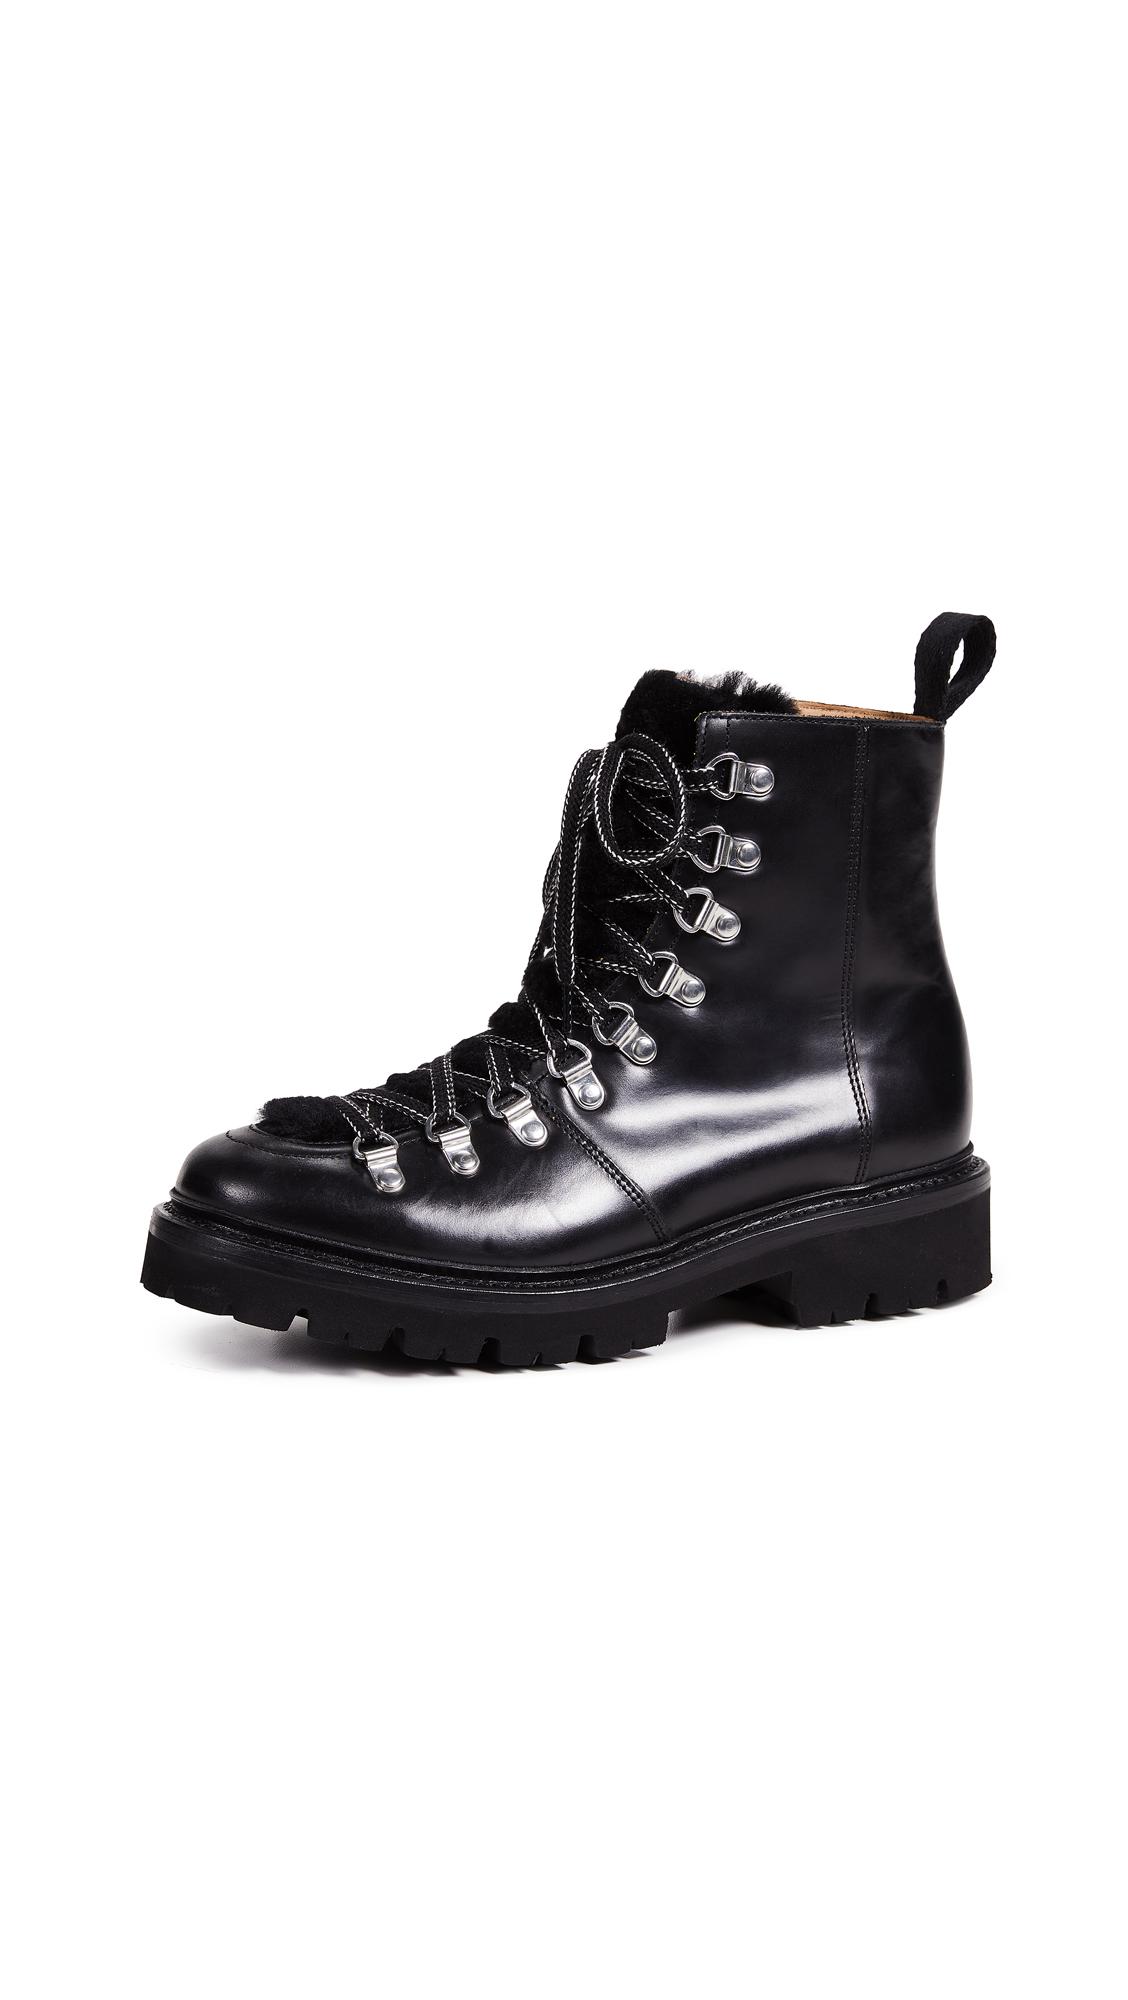 a19fd9149aa Nanette Combat Boots in Black/Black